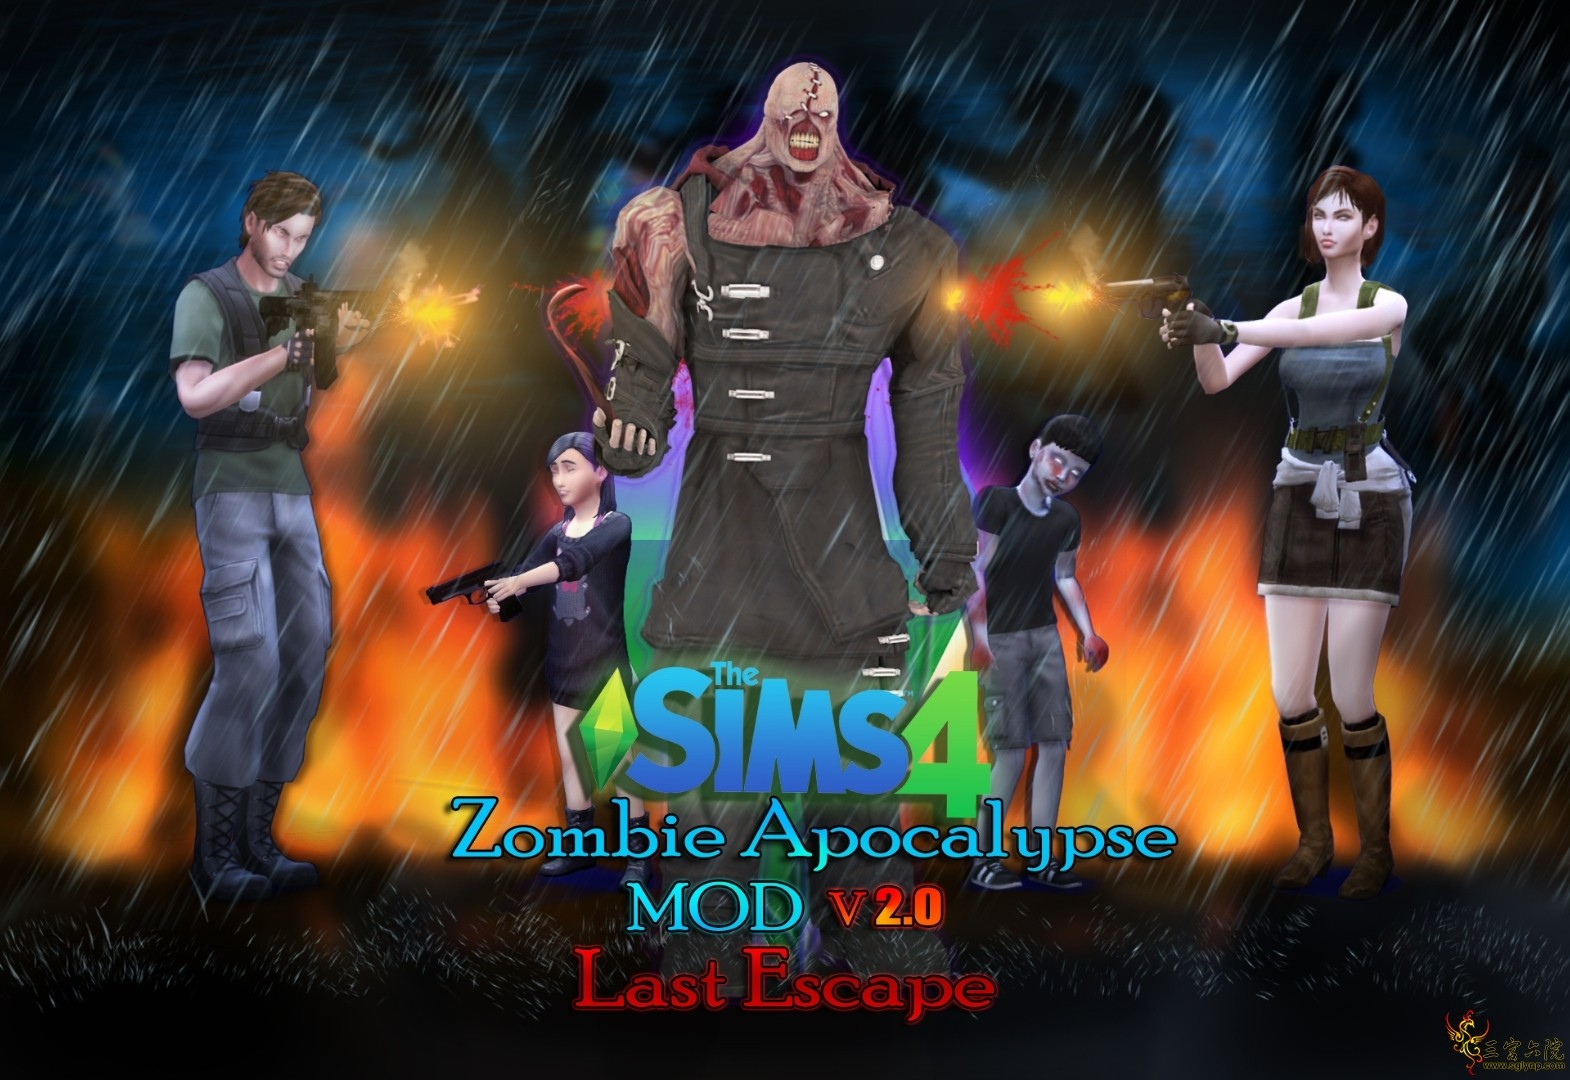 Zombie Apocalypse -MOD- v2.0 Thumbnail background.jpg